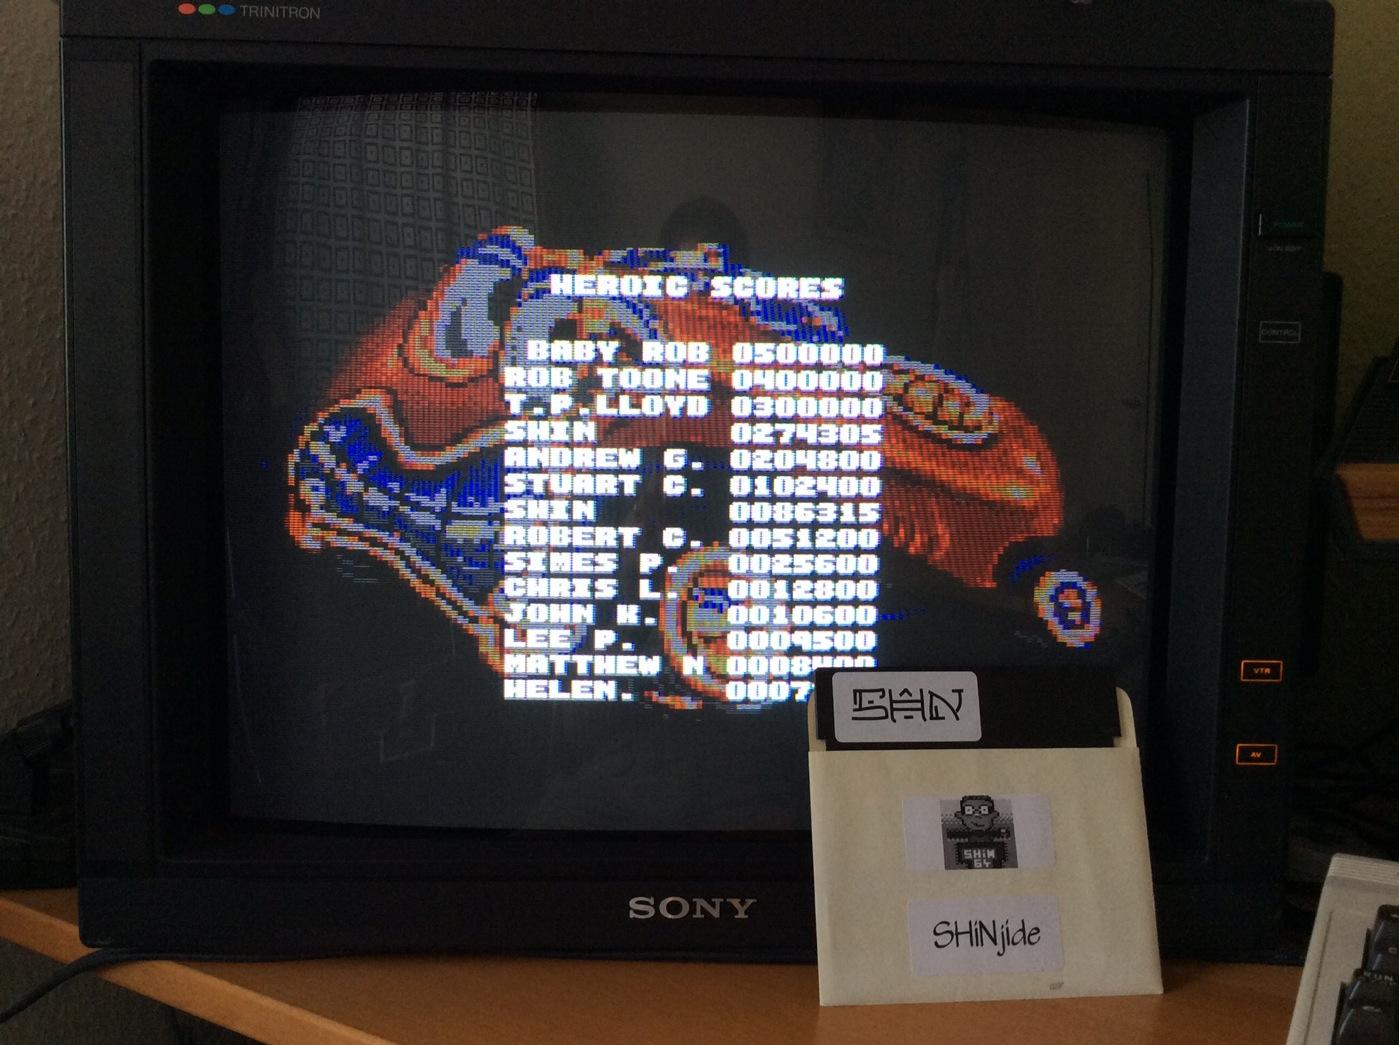 SHiNjide: Car-Vup (Amiga) 274,305 points on 2014-07-15 05:38:07